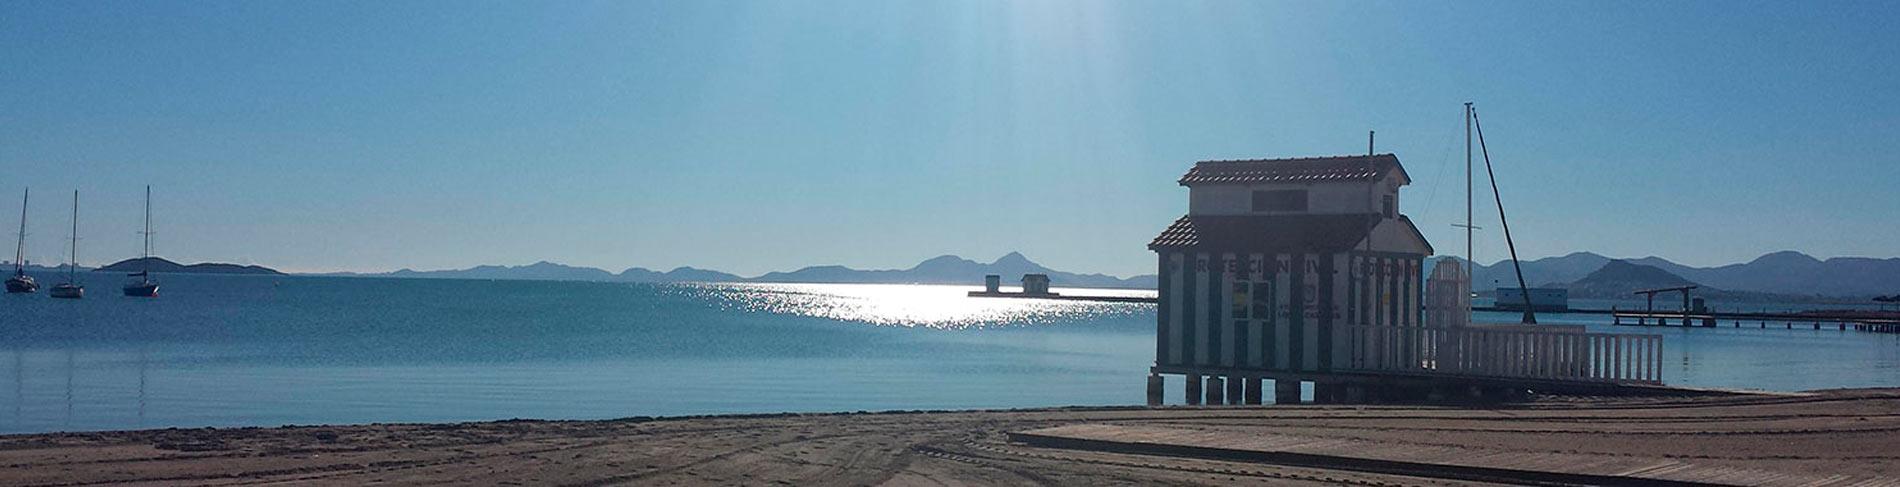 Mar Menor serie panoramica Balneario